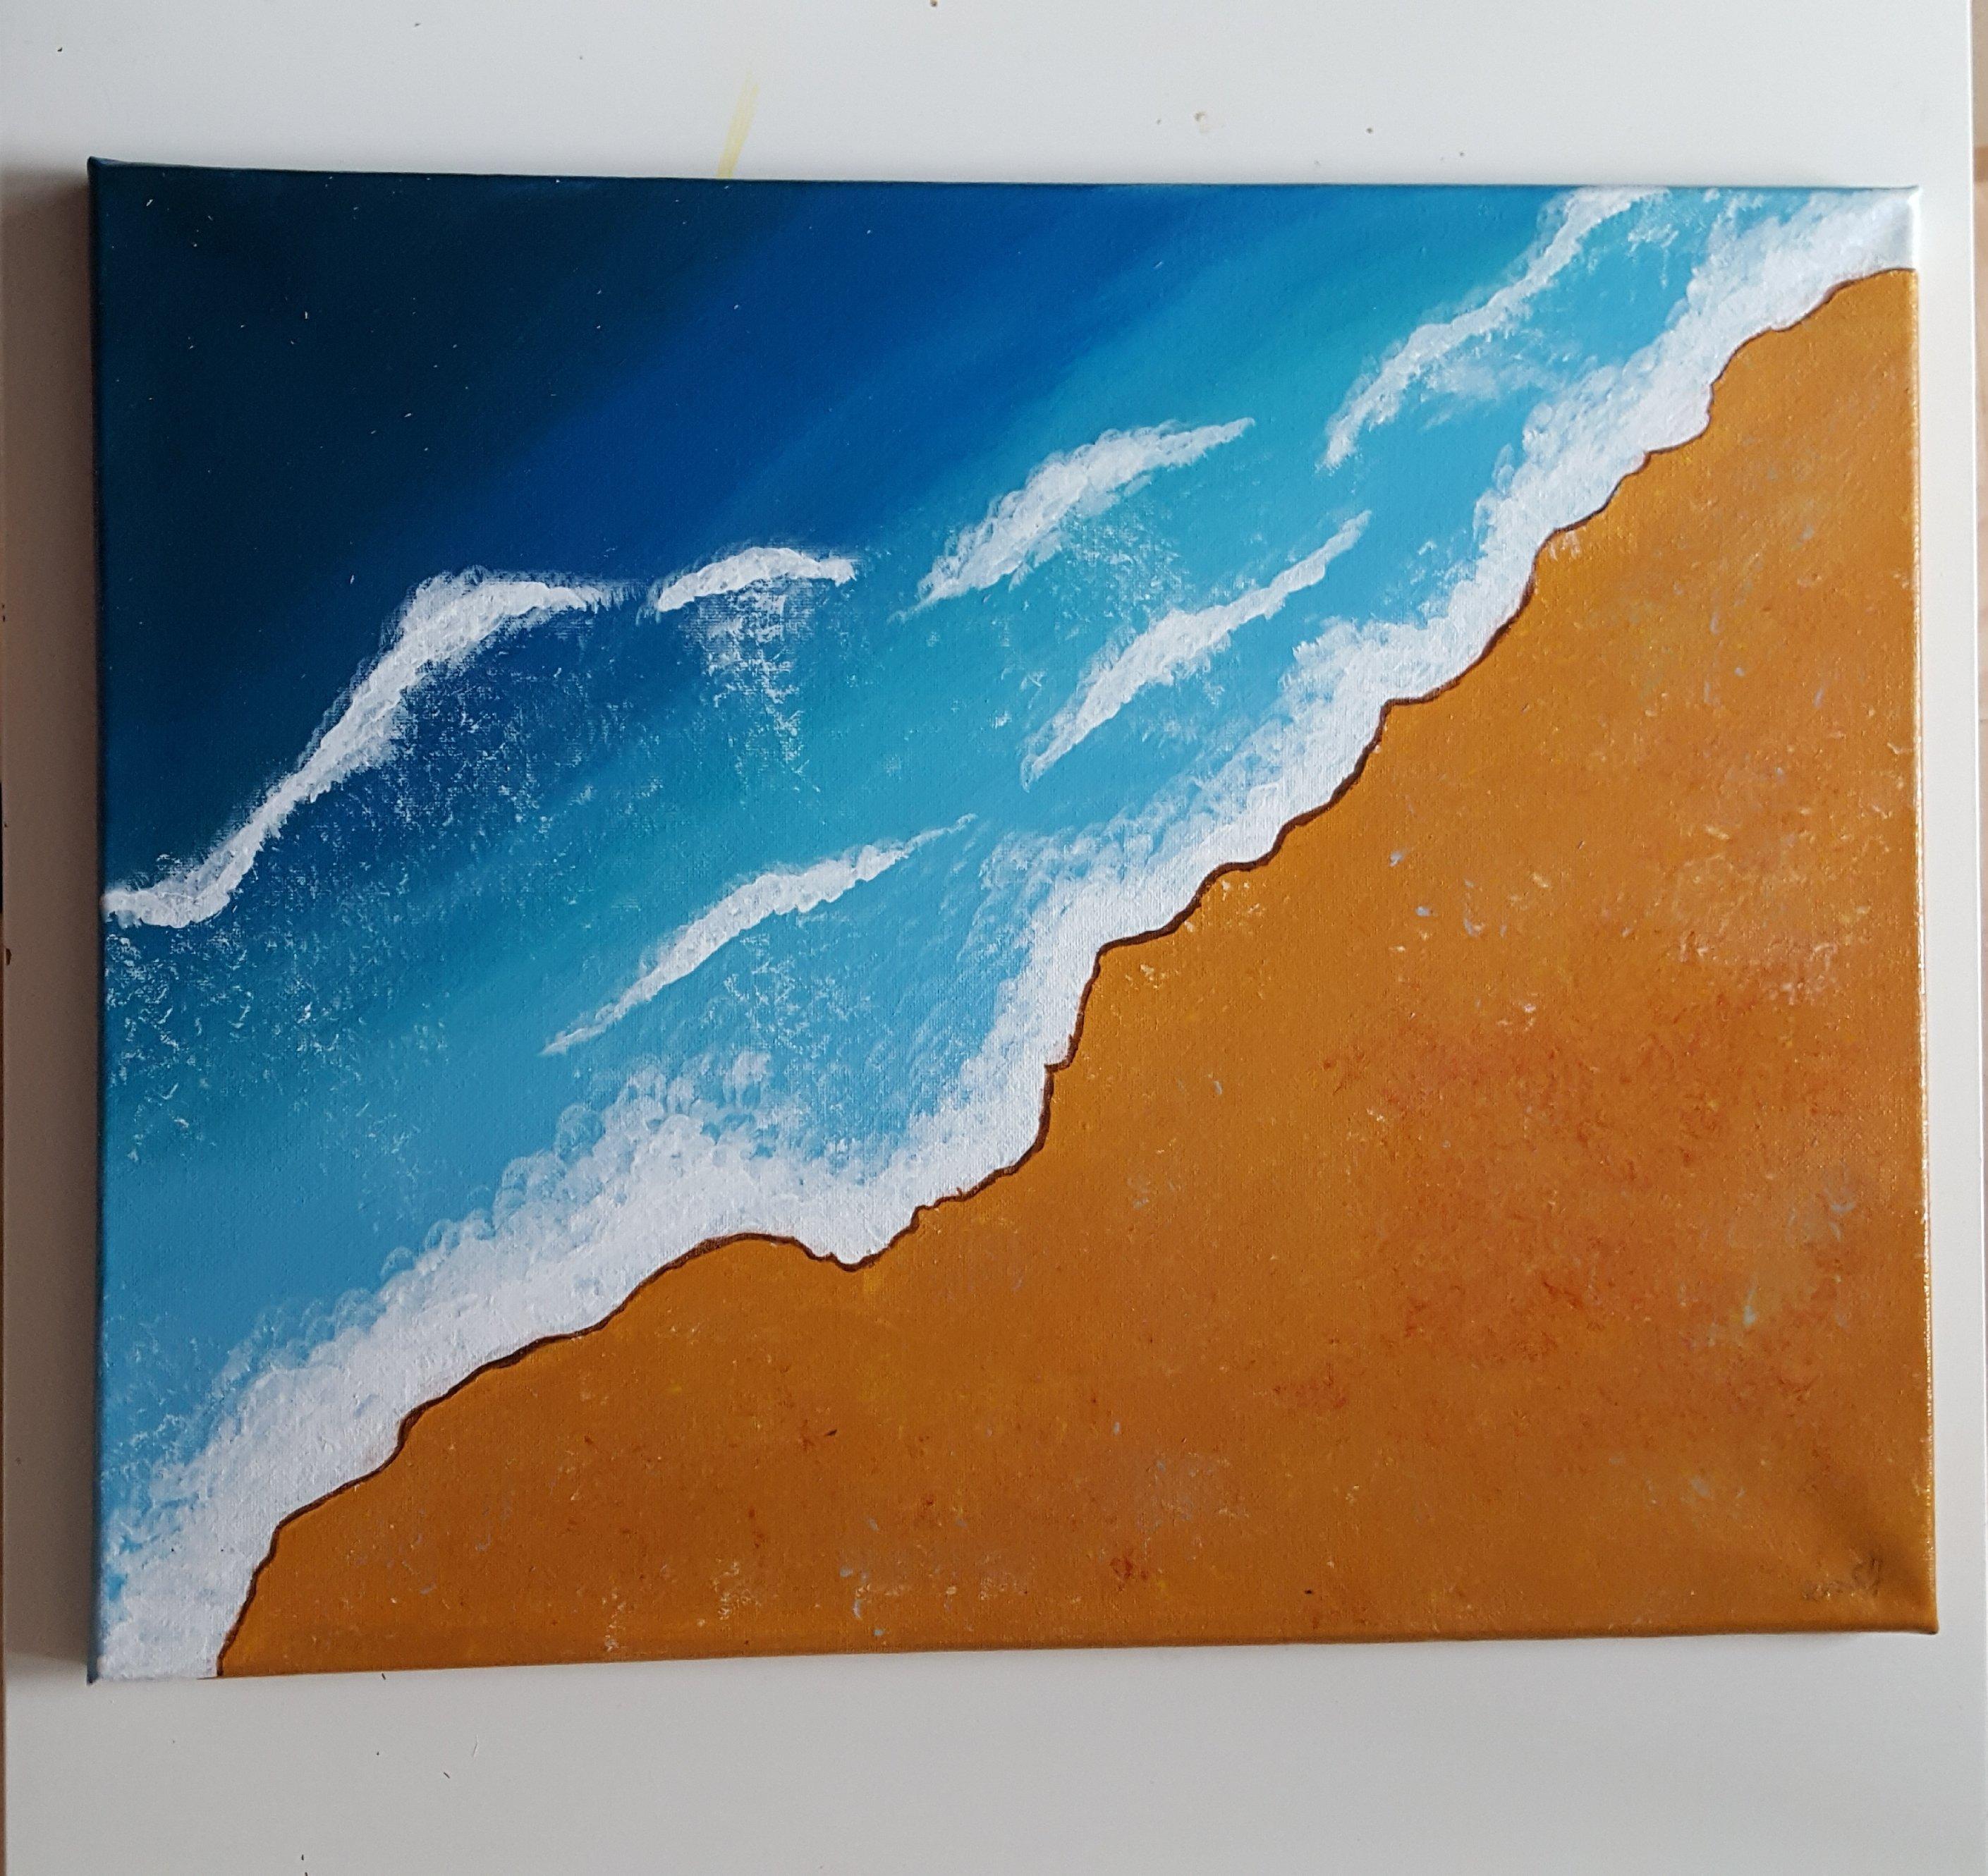 Land & Meer 2   Acryl Gemälde auf Keilrahmen 40x50 cm 2cm Höhe .  Signatur Sarah Jade S.J 11